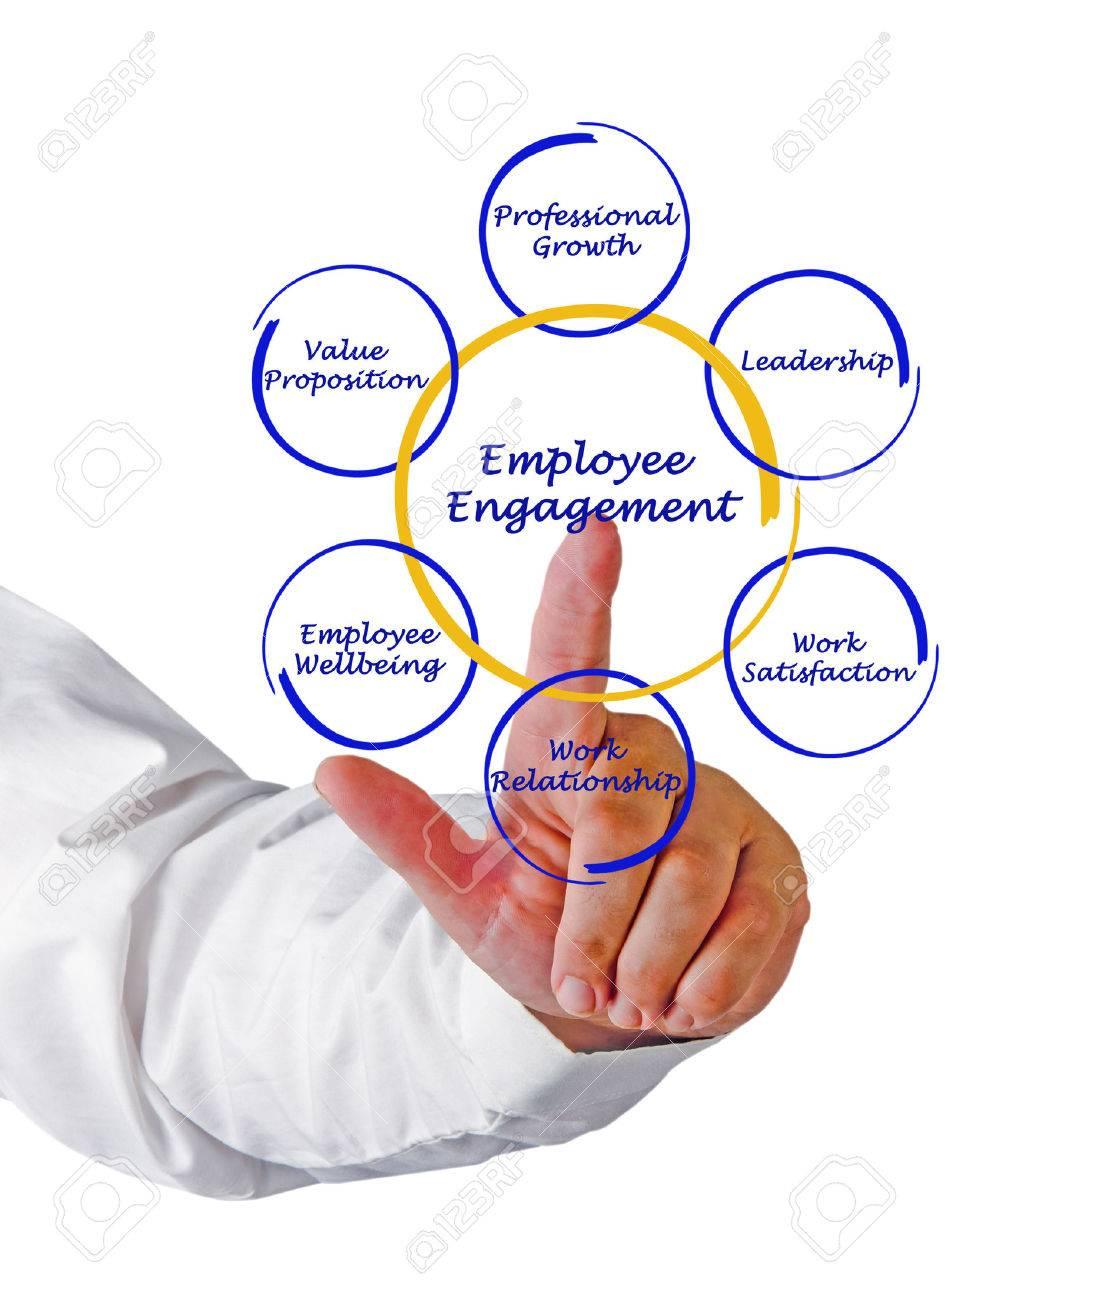 employee engagement Stock Photo - 33424232